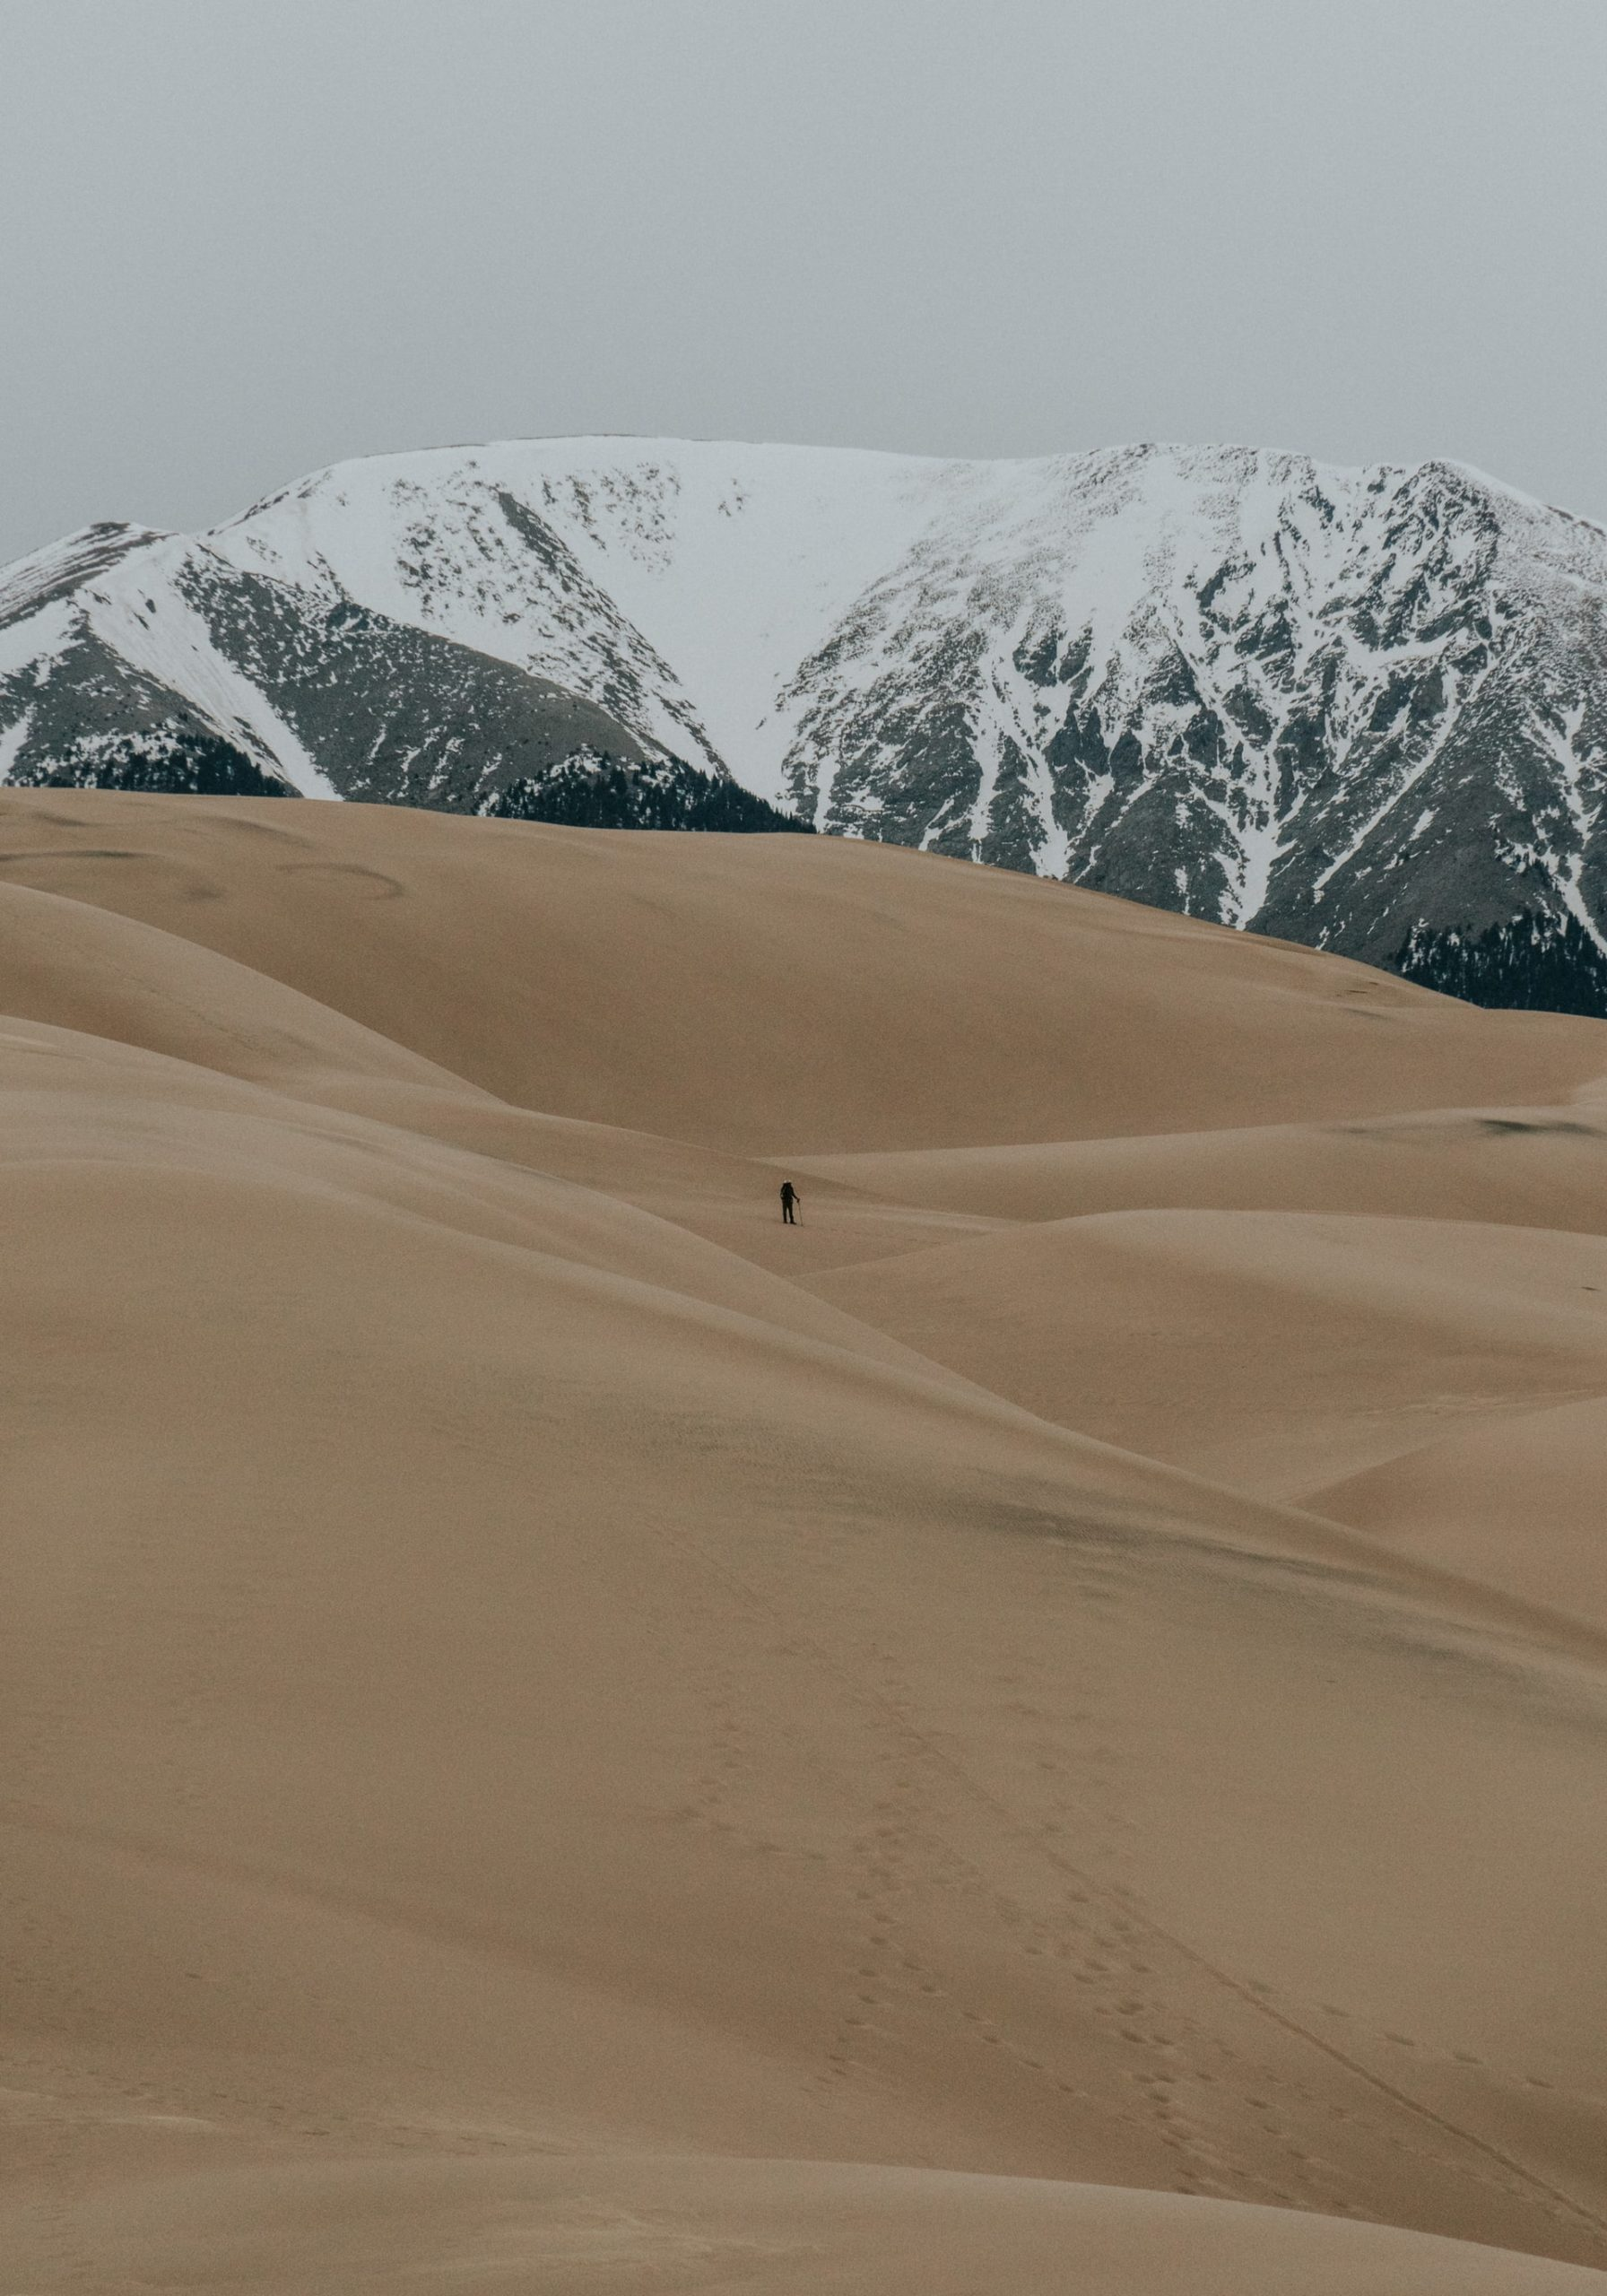 Colorado Great Sand Dunes